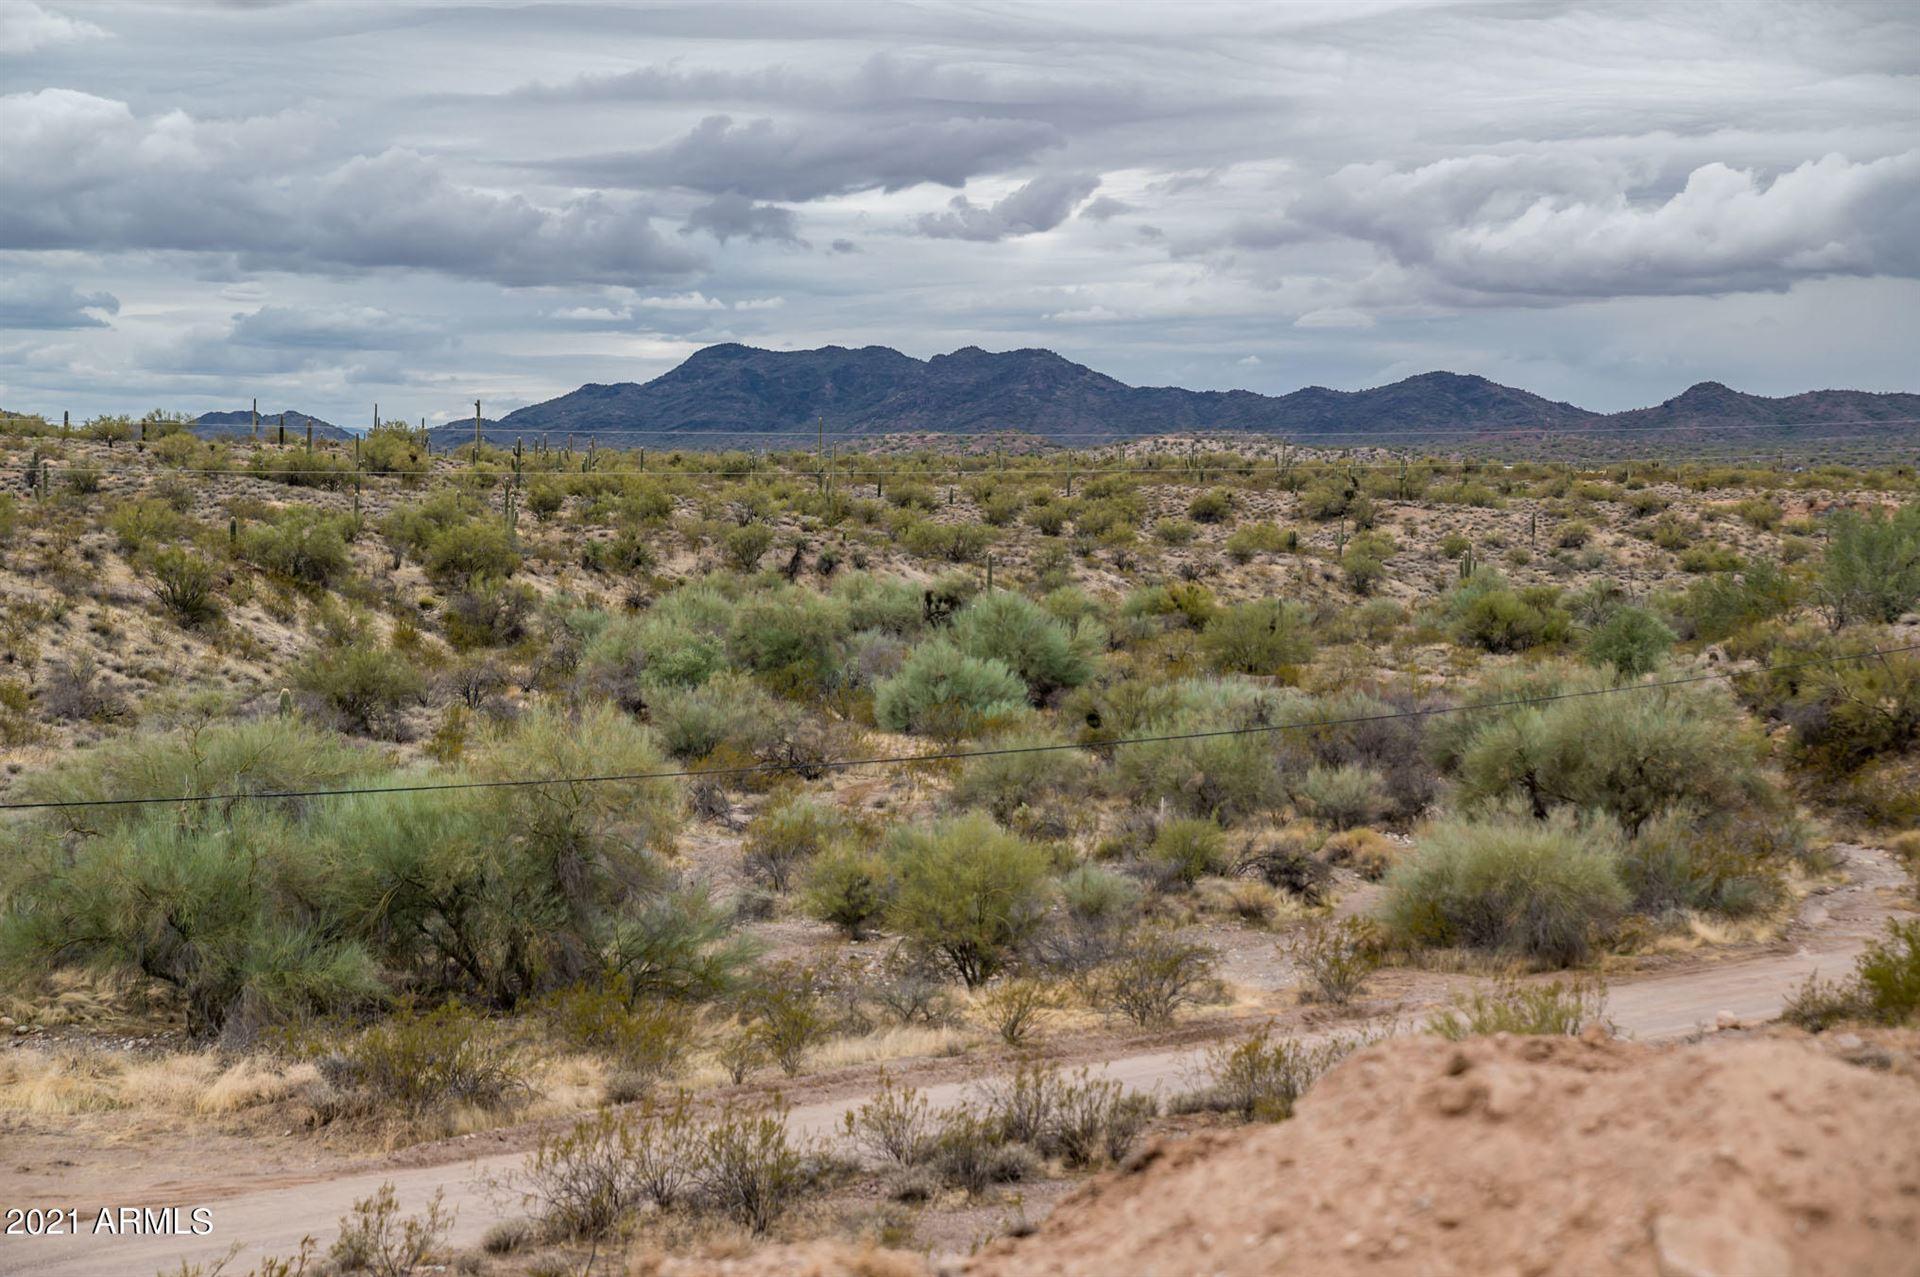 Photo of 42900 N 271 Avenue, Morristown, AZ 85342 (MLS # 6190313)